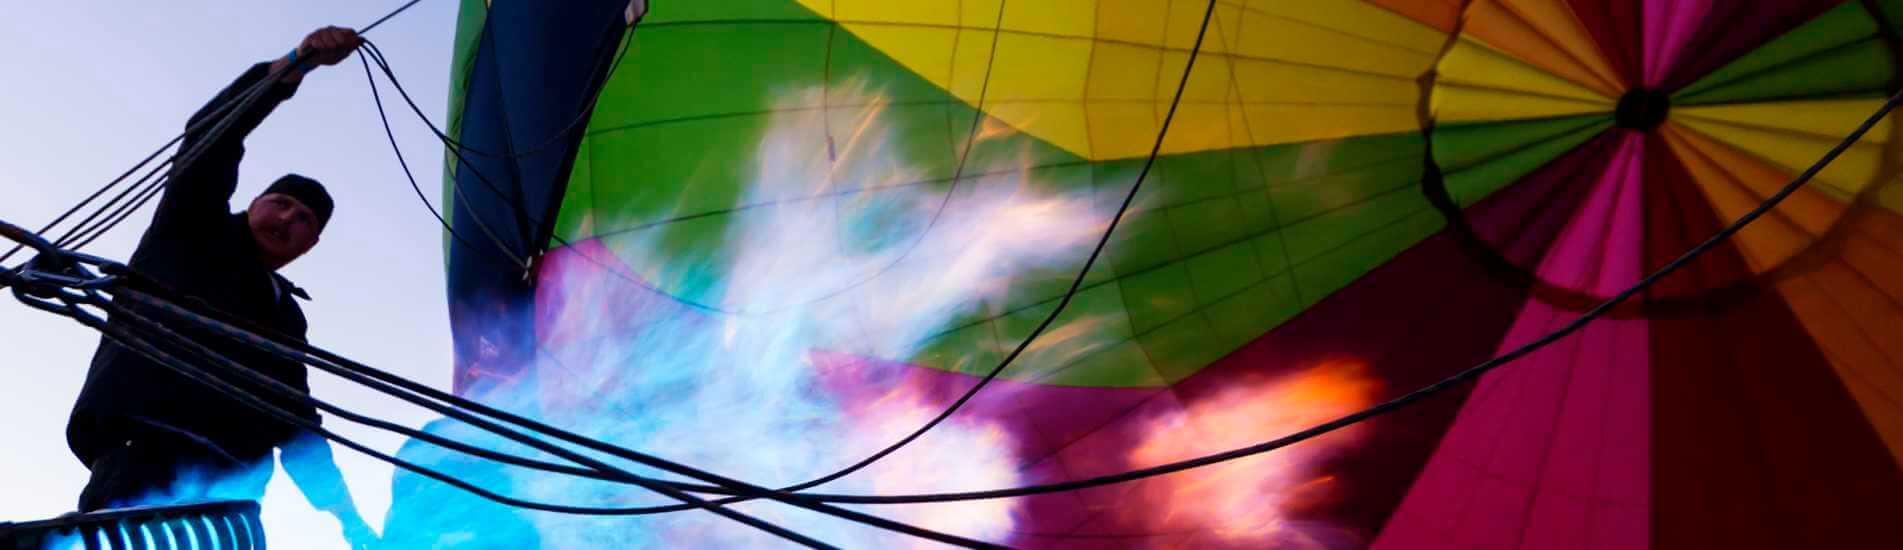 Get Above It All During The Albuquerque International Balloon Fiesta